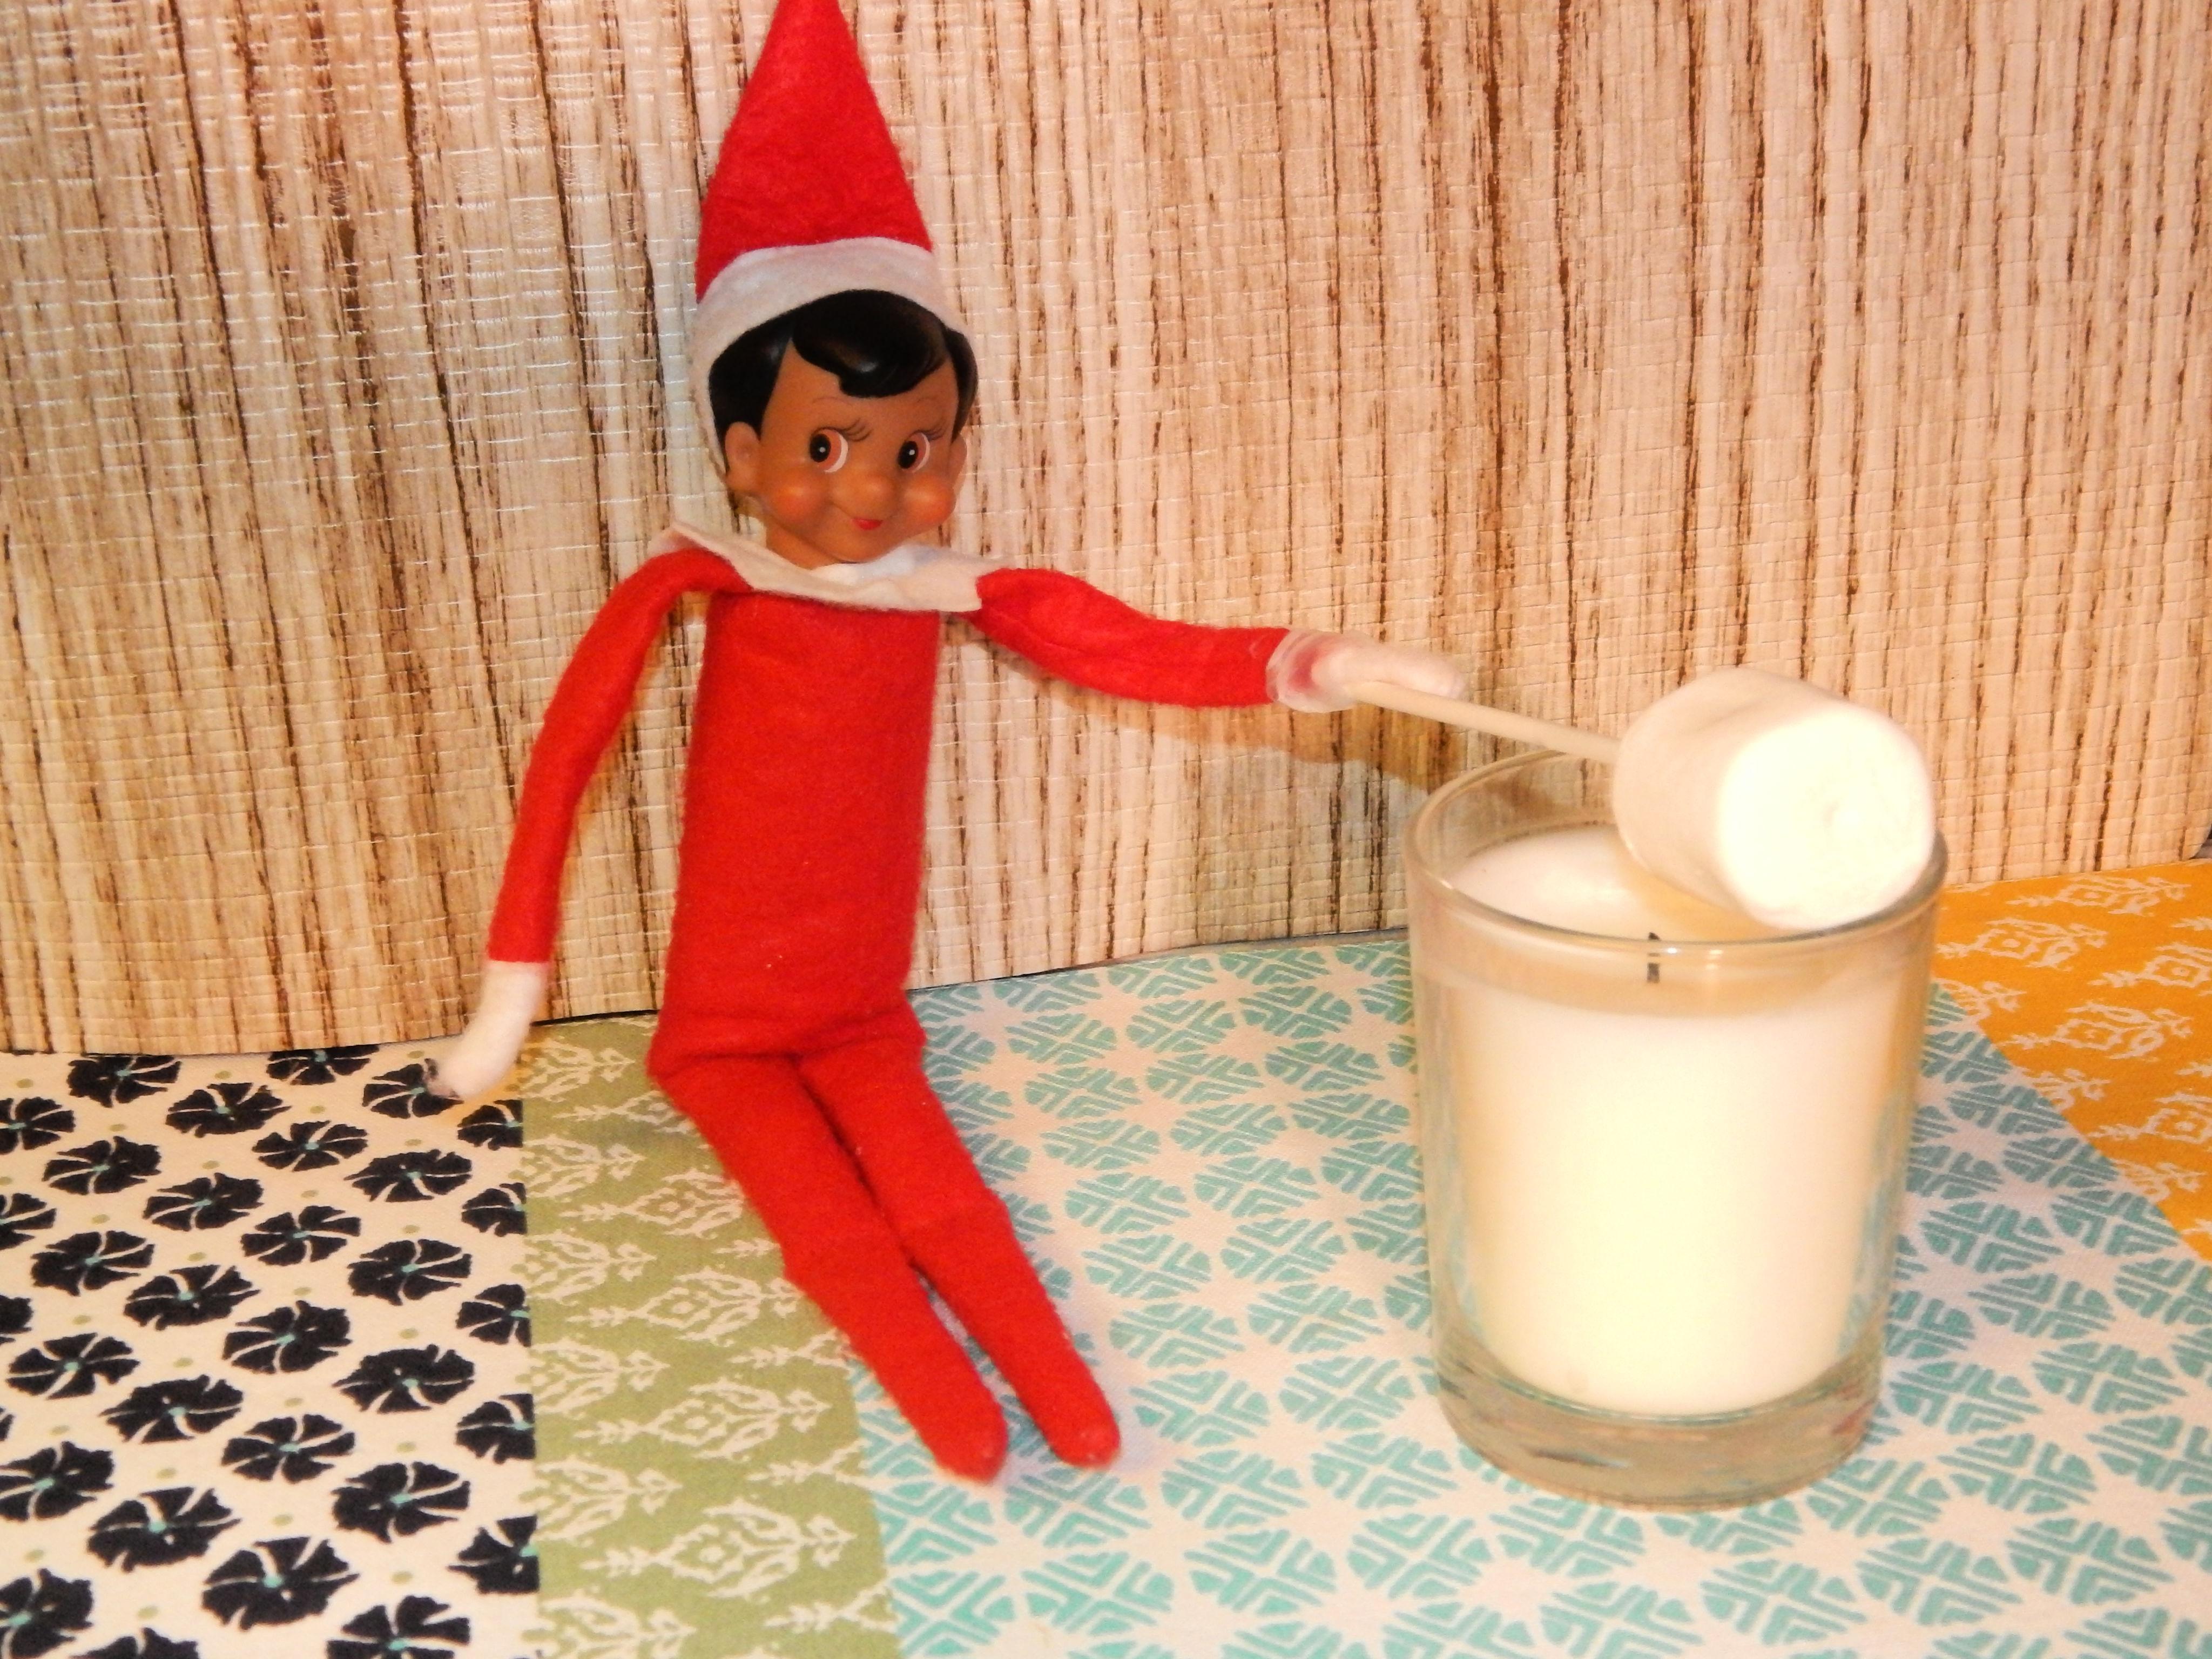 Elf On The Shelf Roasting Marshmallow